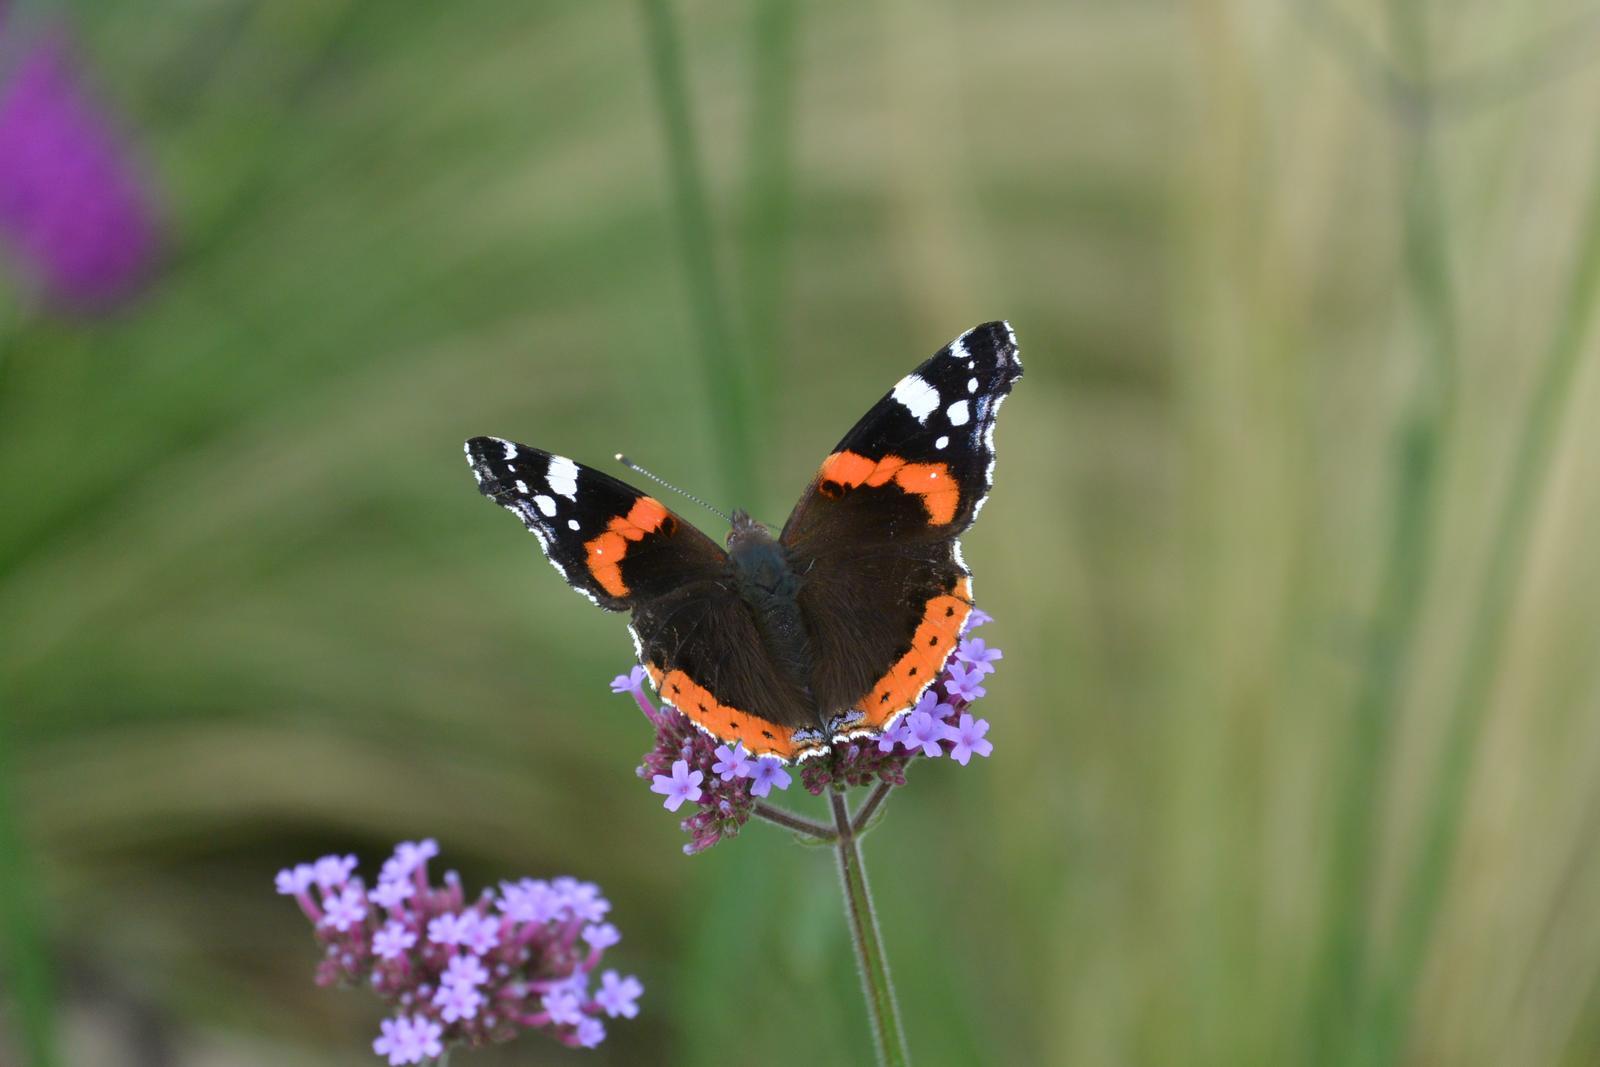 Motýlí zahrada 2019-2020 - Obrázek č. 54